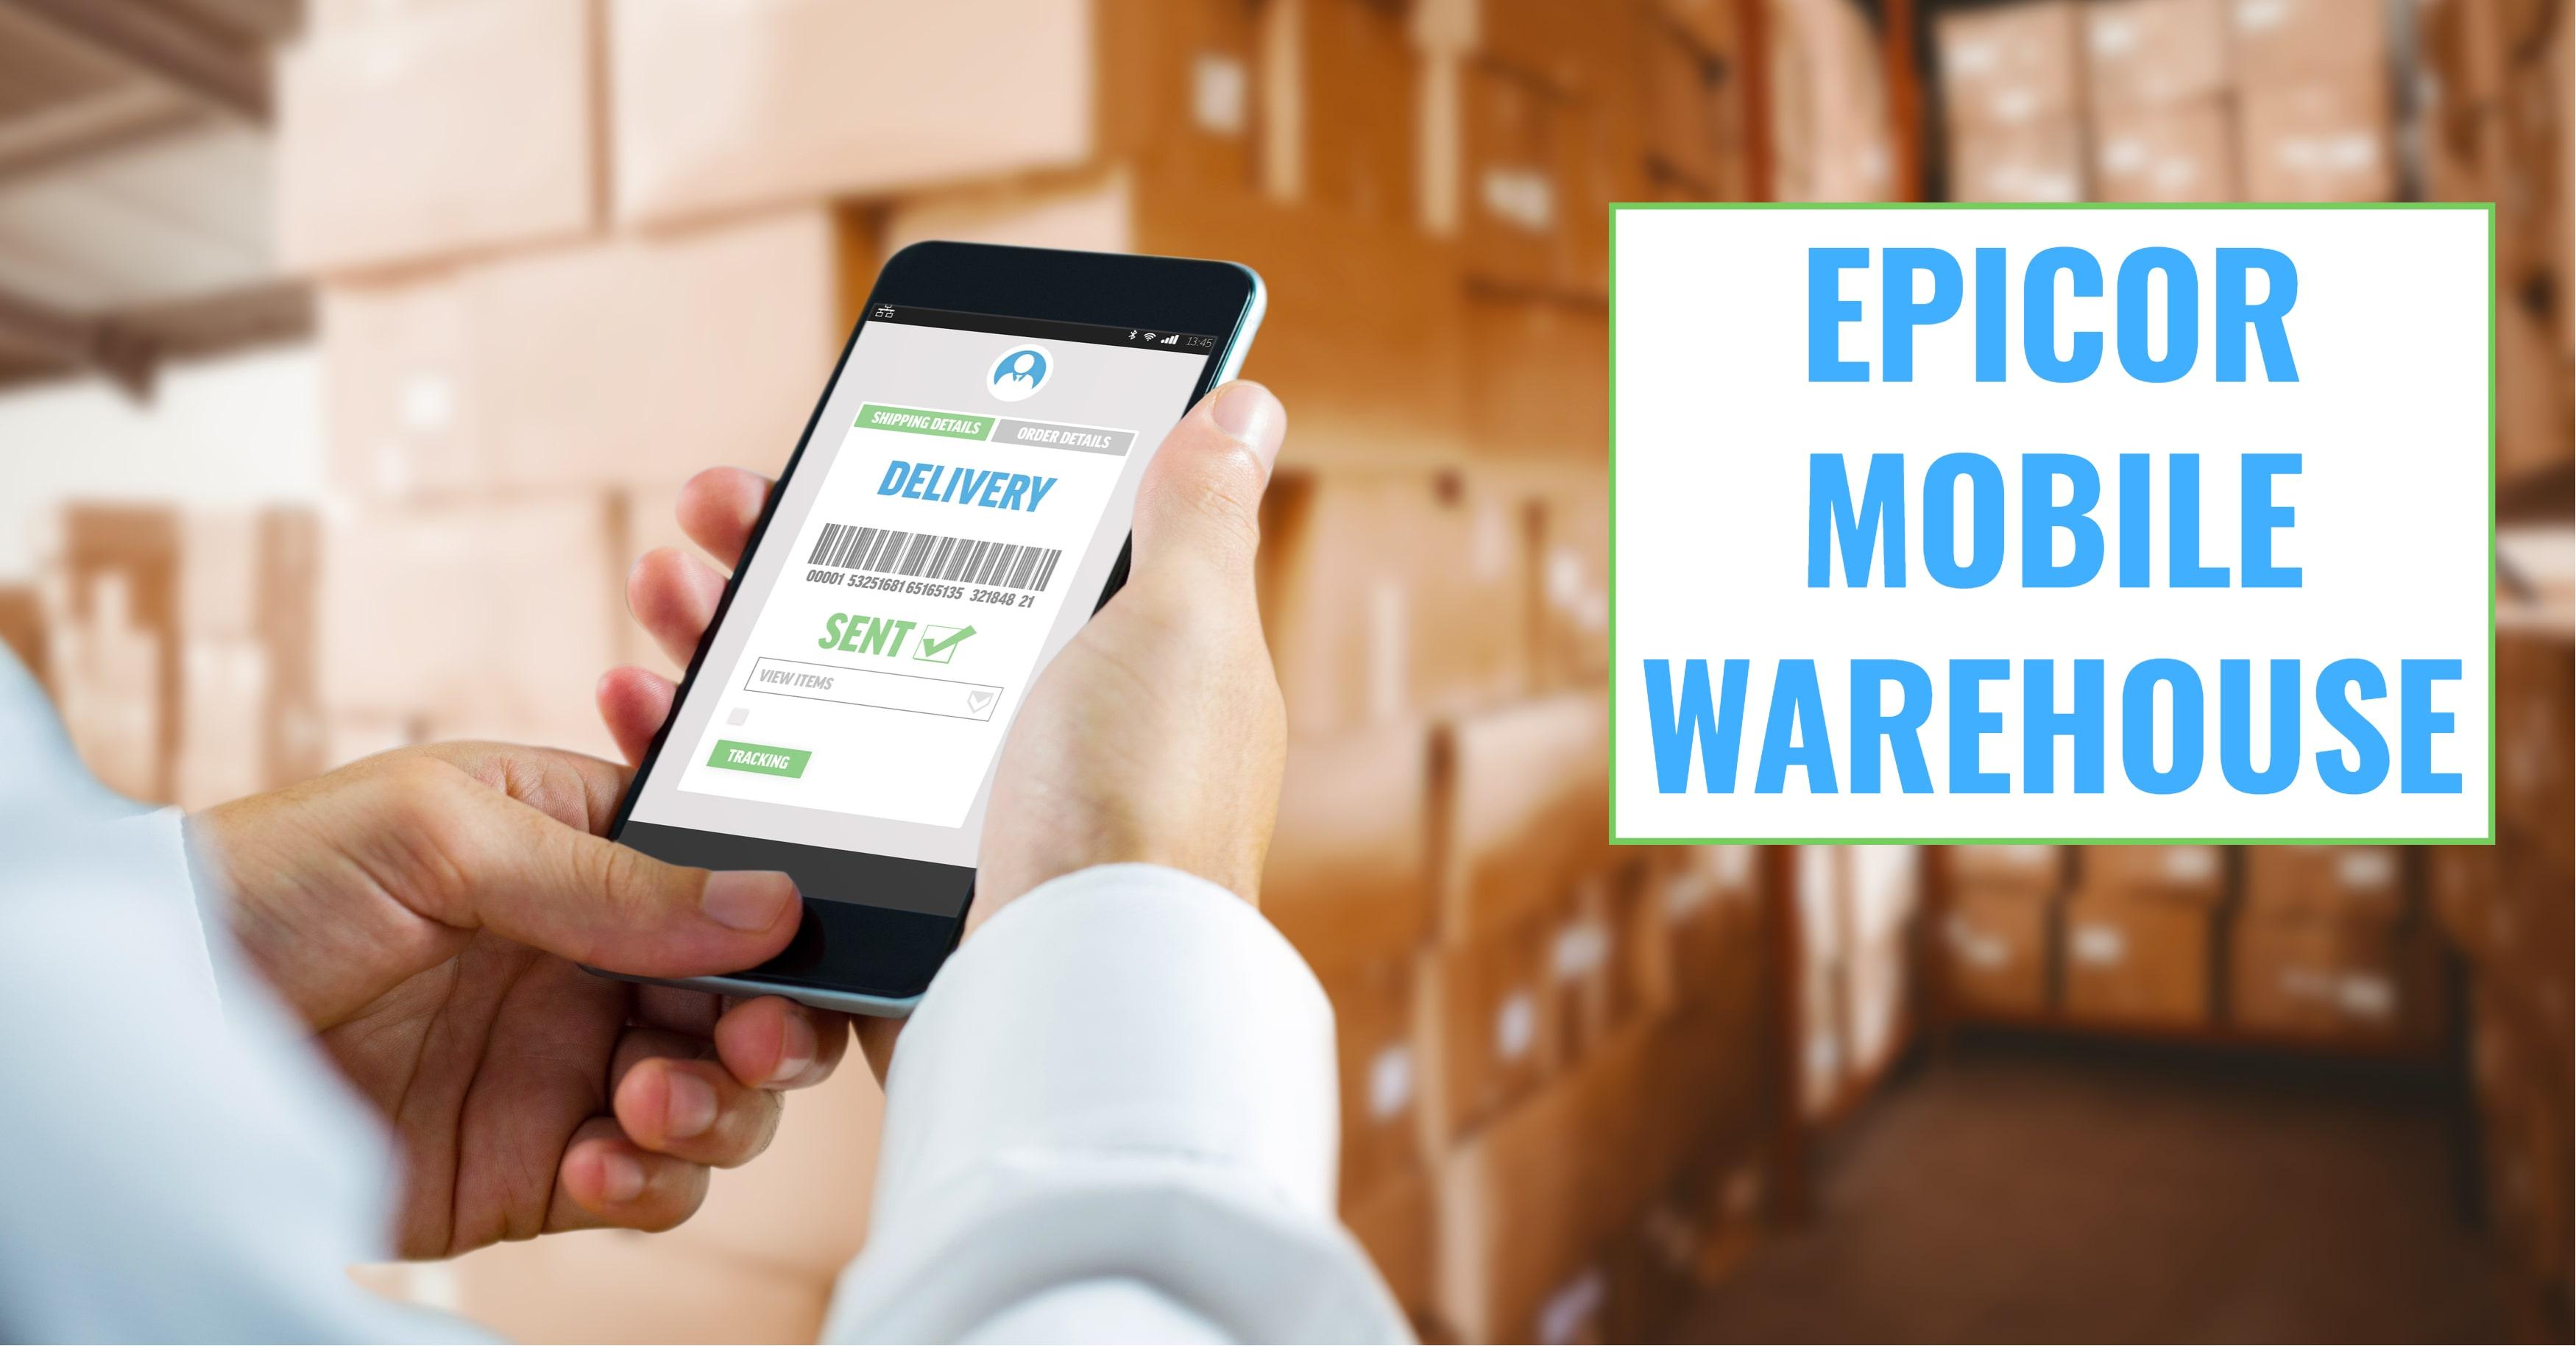 Quick Rundown of Epicor Mobile Warehouse